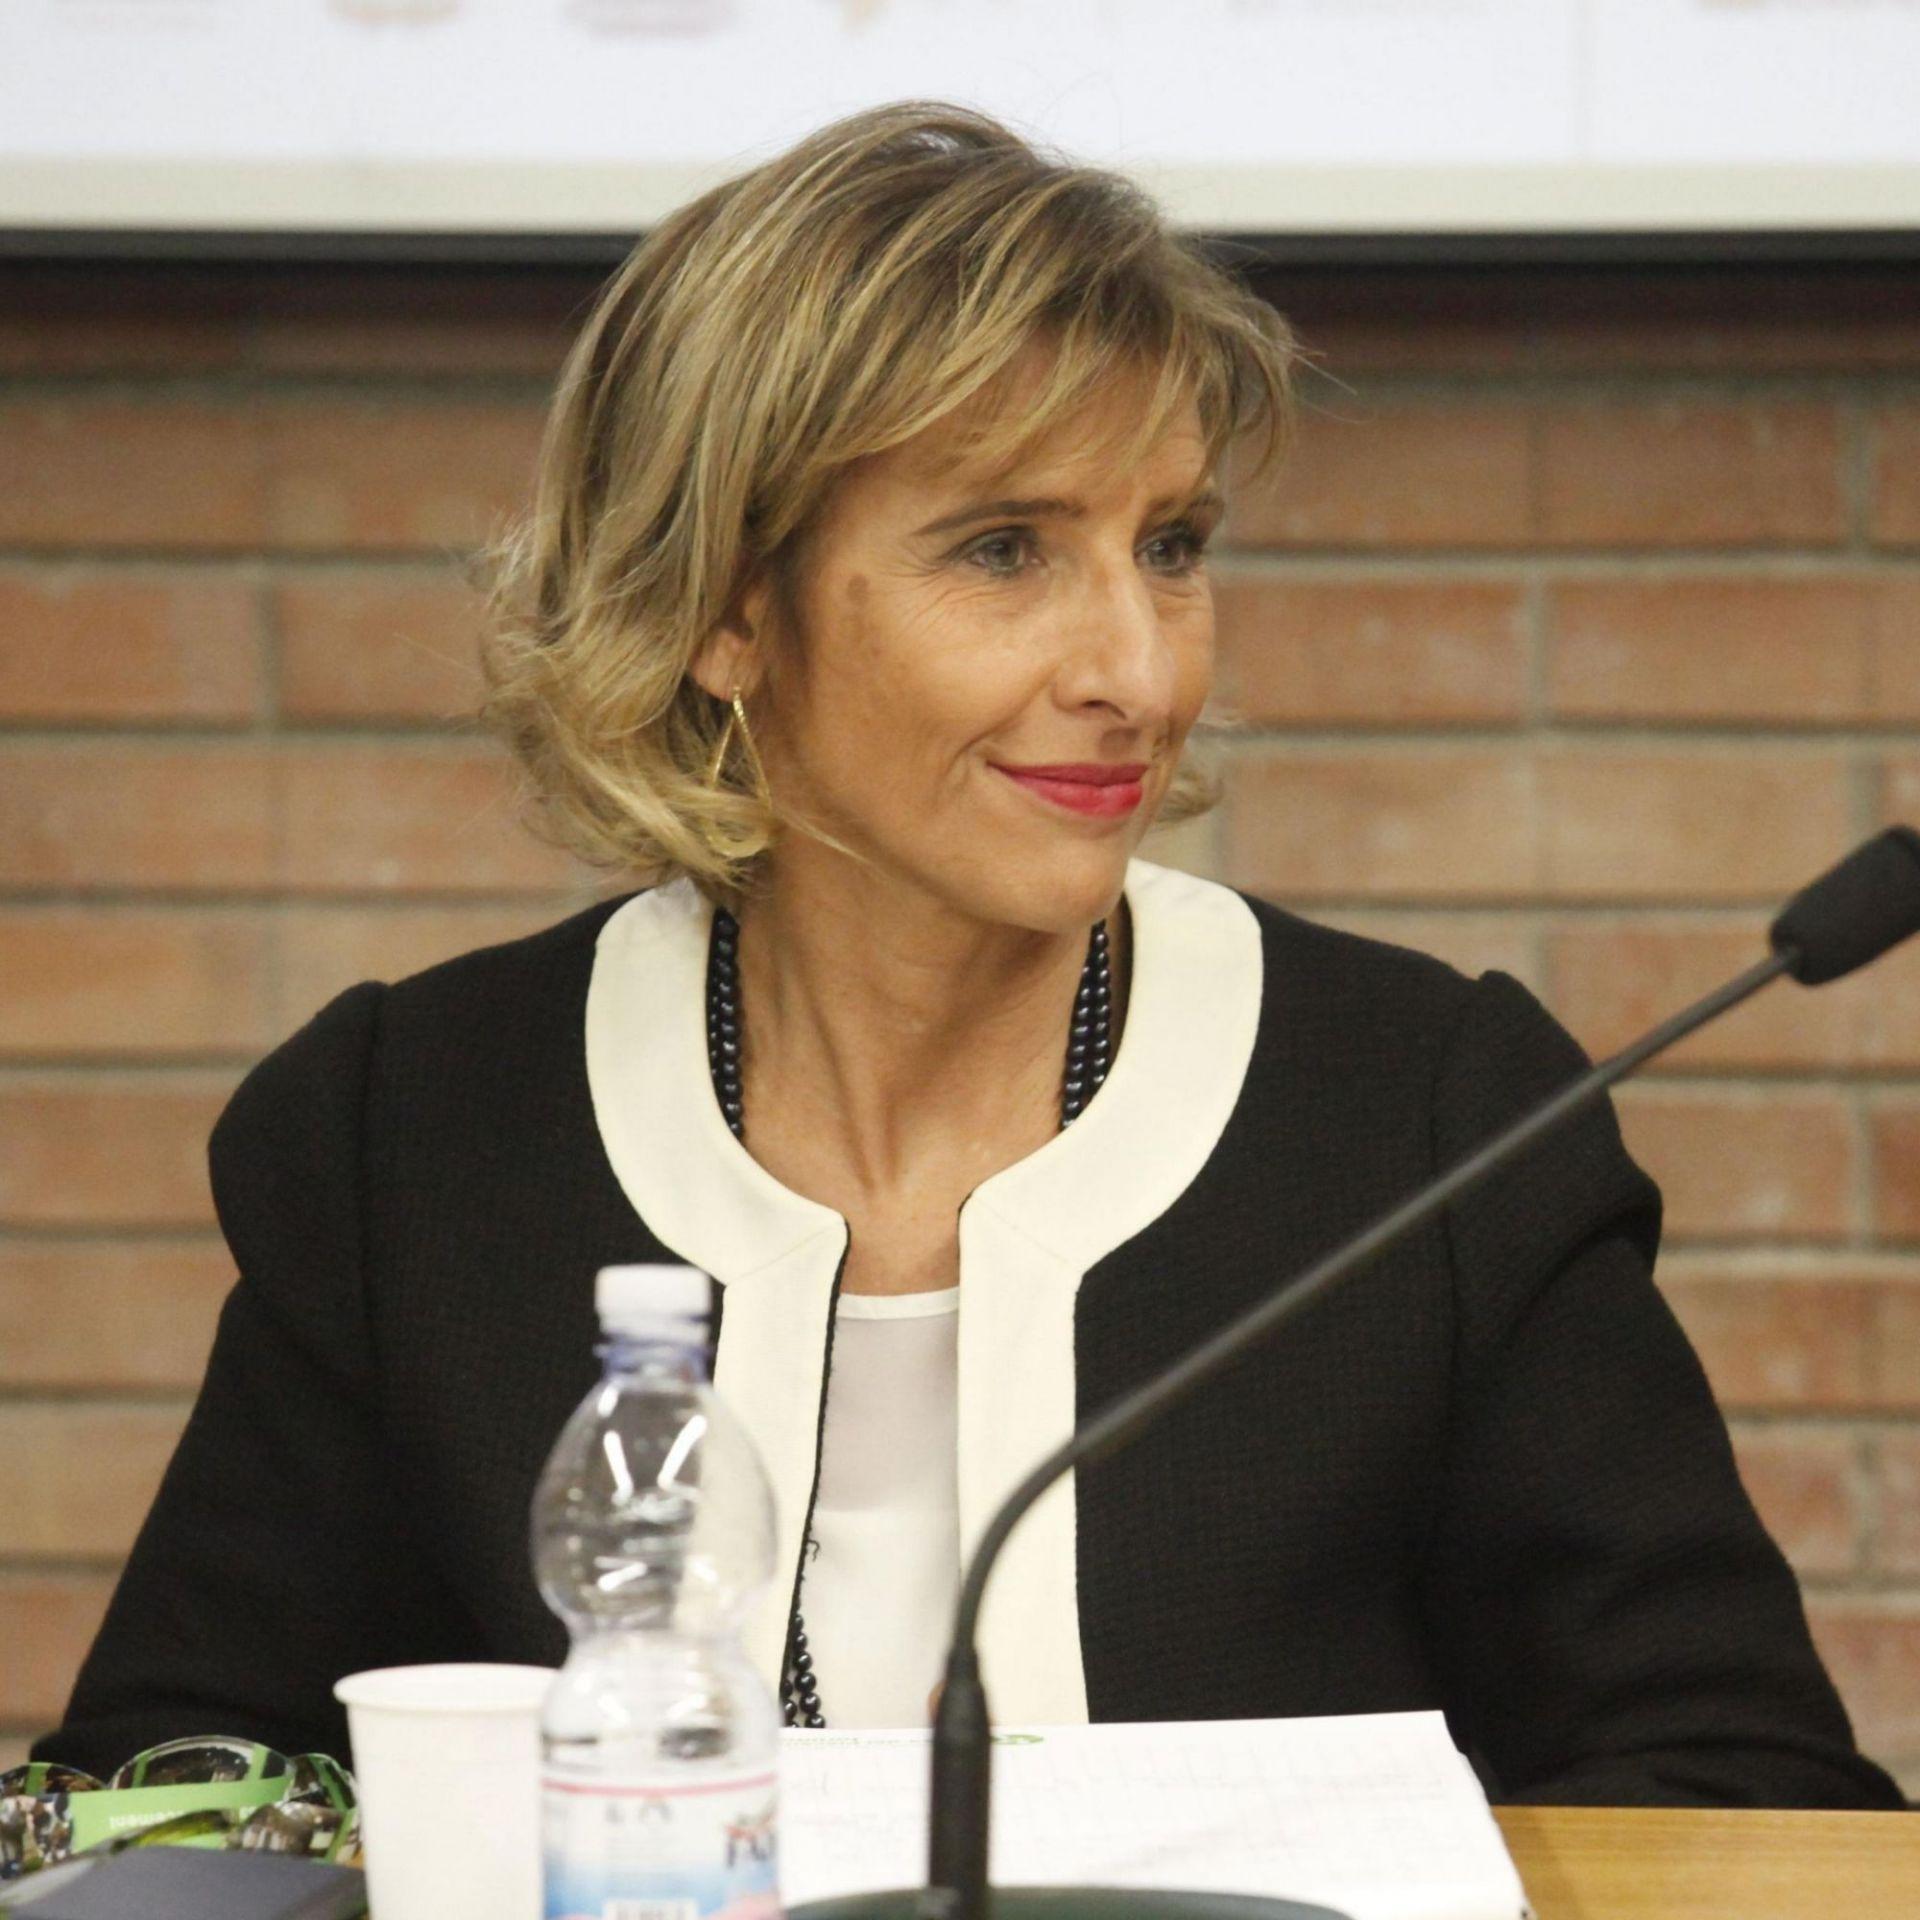 Maria Grazia Falciatore